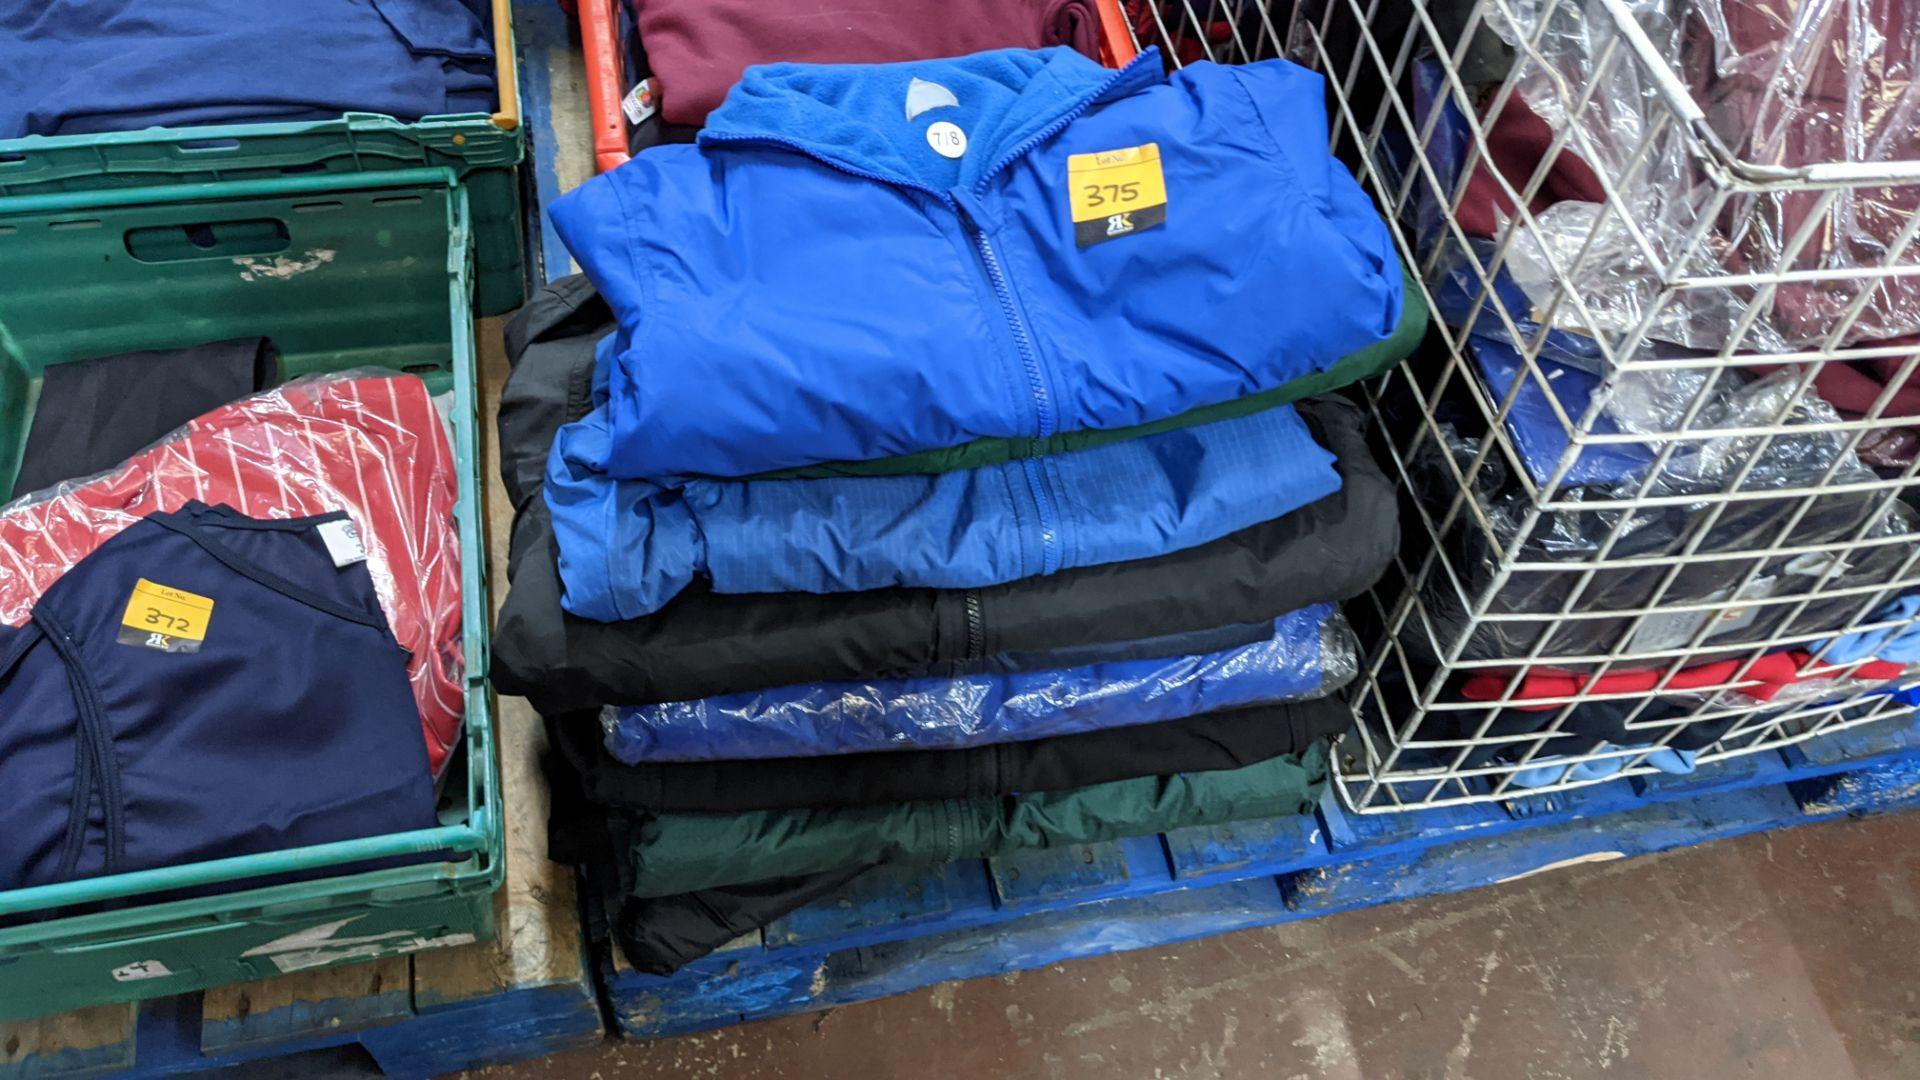 Approx 10 off assorted children's zip up jackets